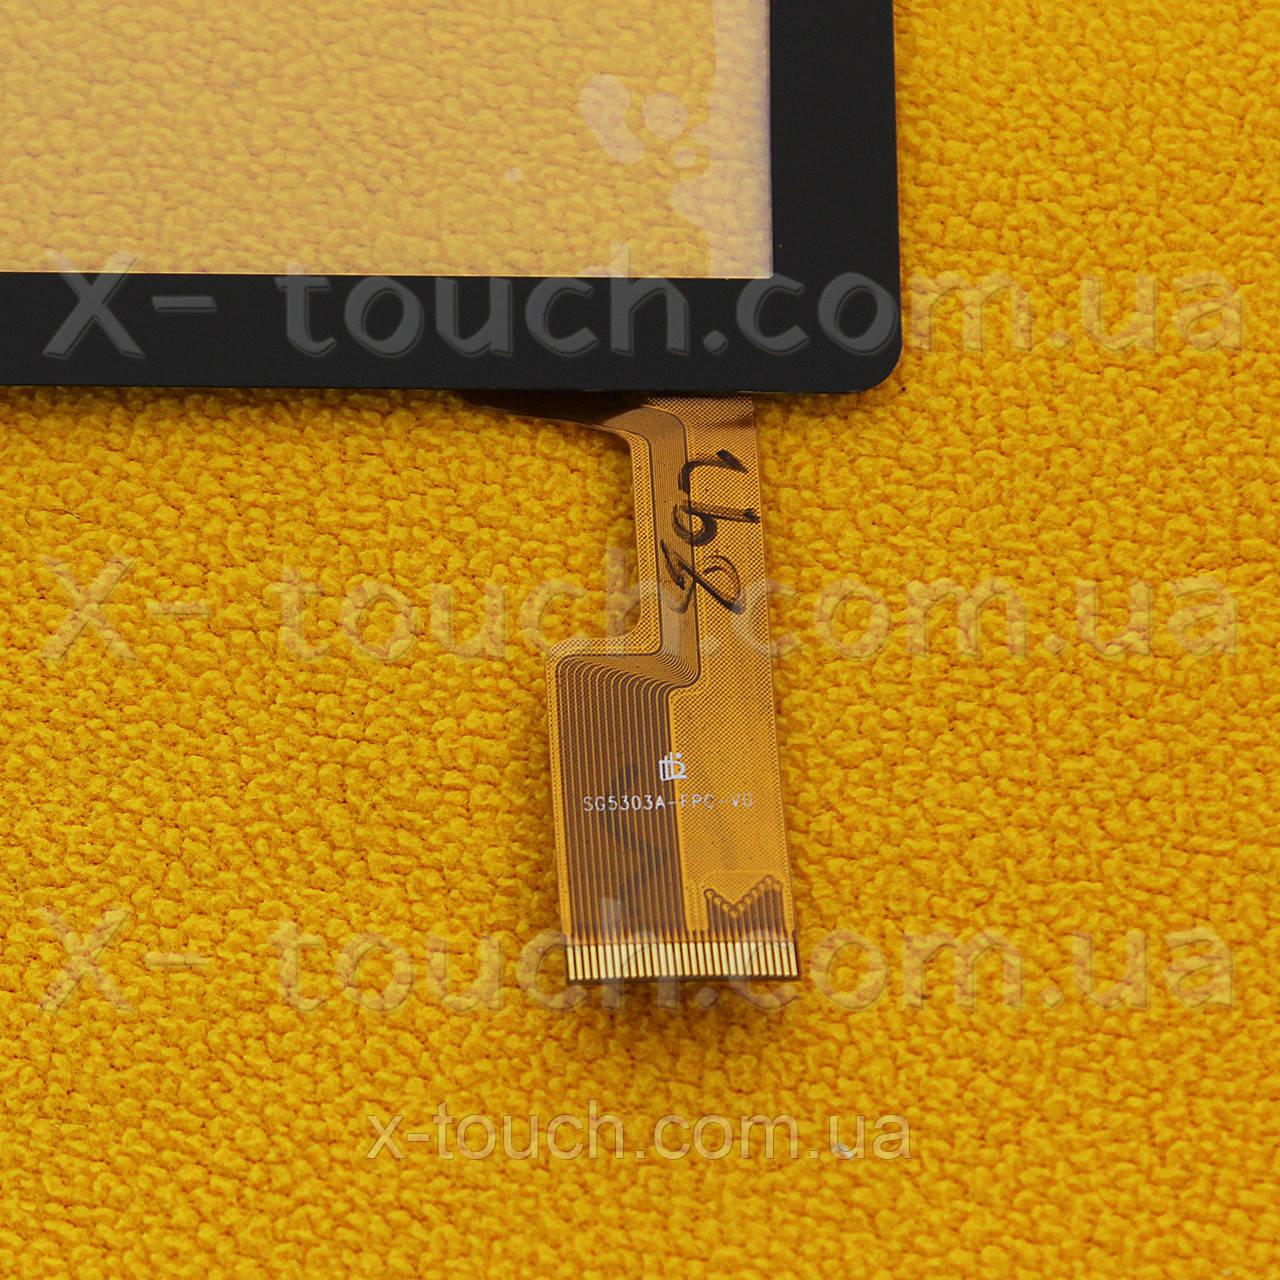 Тачскрин, сенсор HH070FPC-020A для планшета